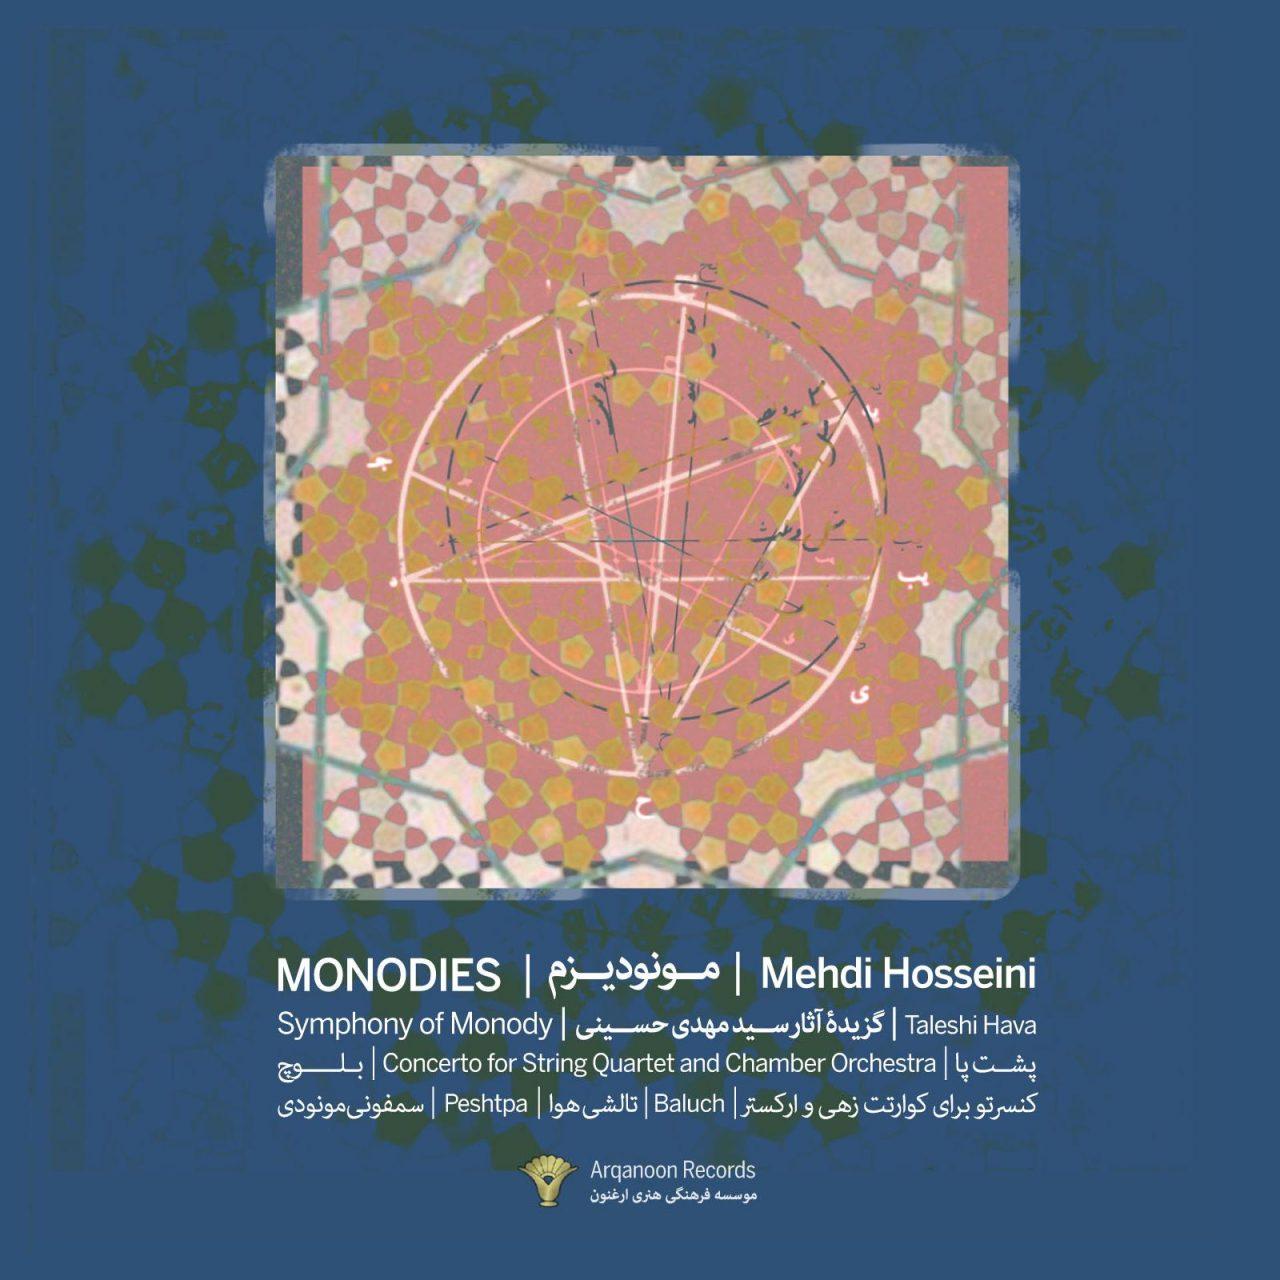 http://www.monodies.com/wp-content/uploads/2019/02/Monodies_Mehdi-Hosseini__1600x1600-1280x1280.jpg